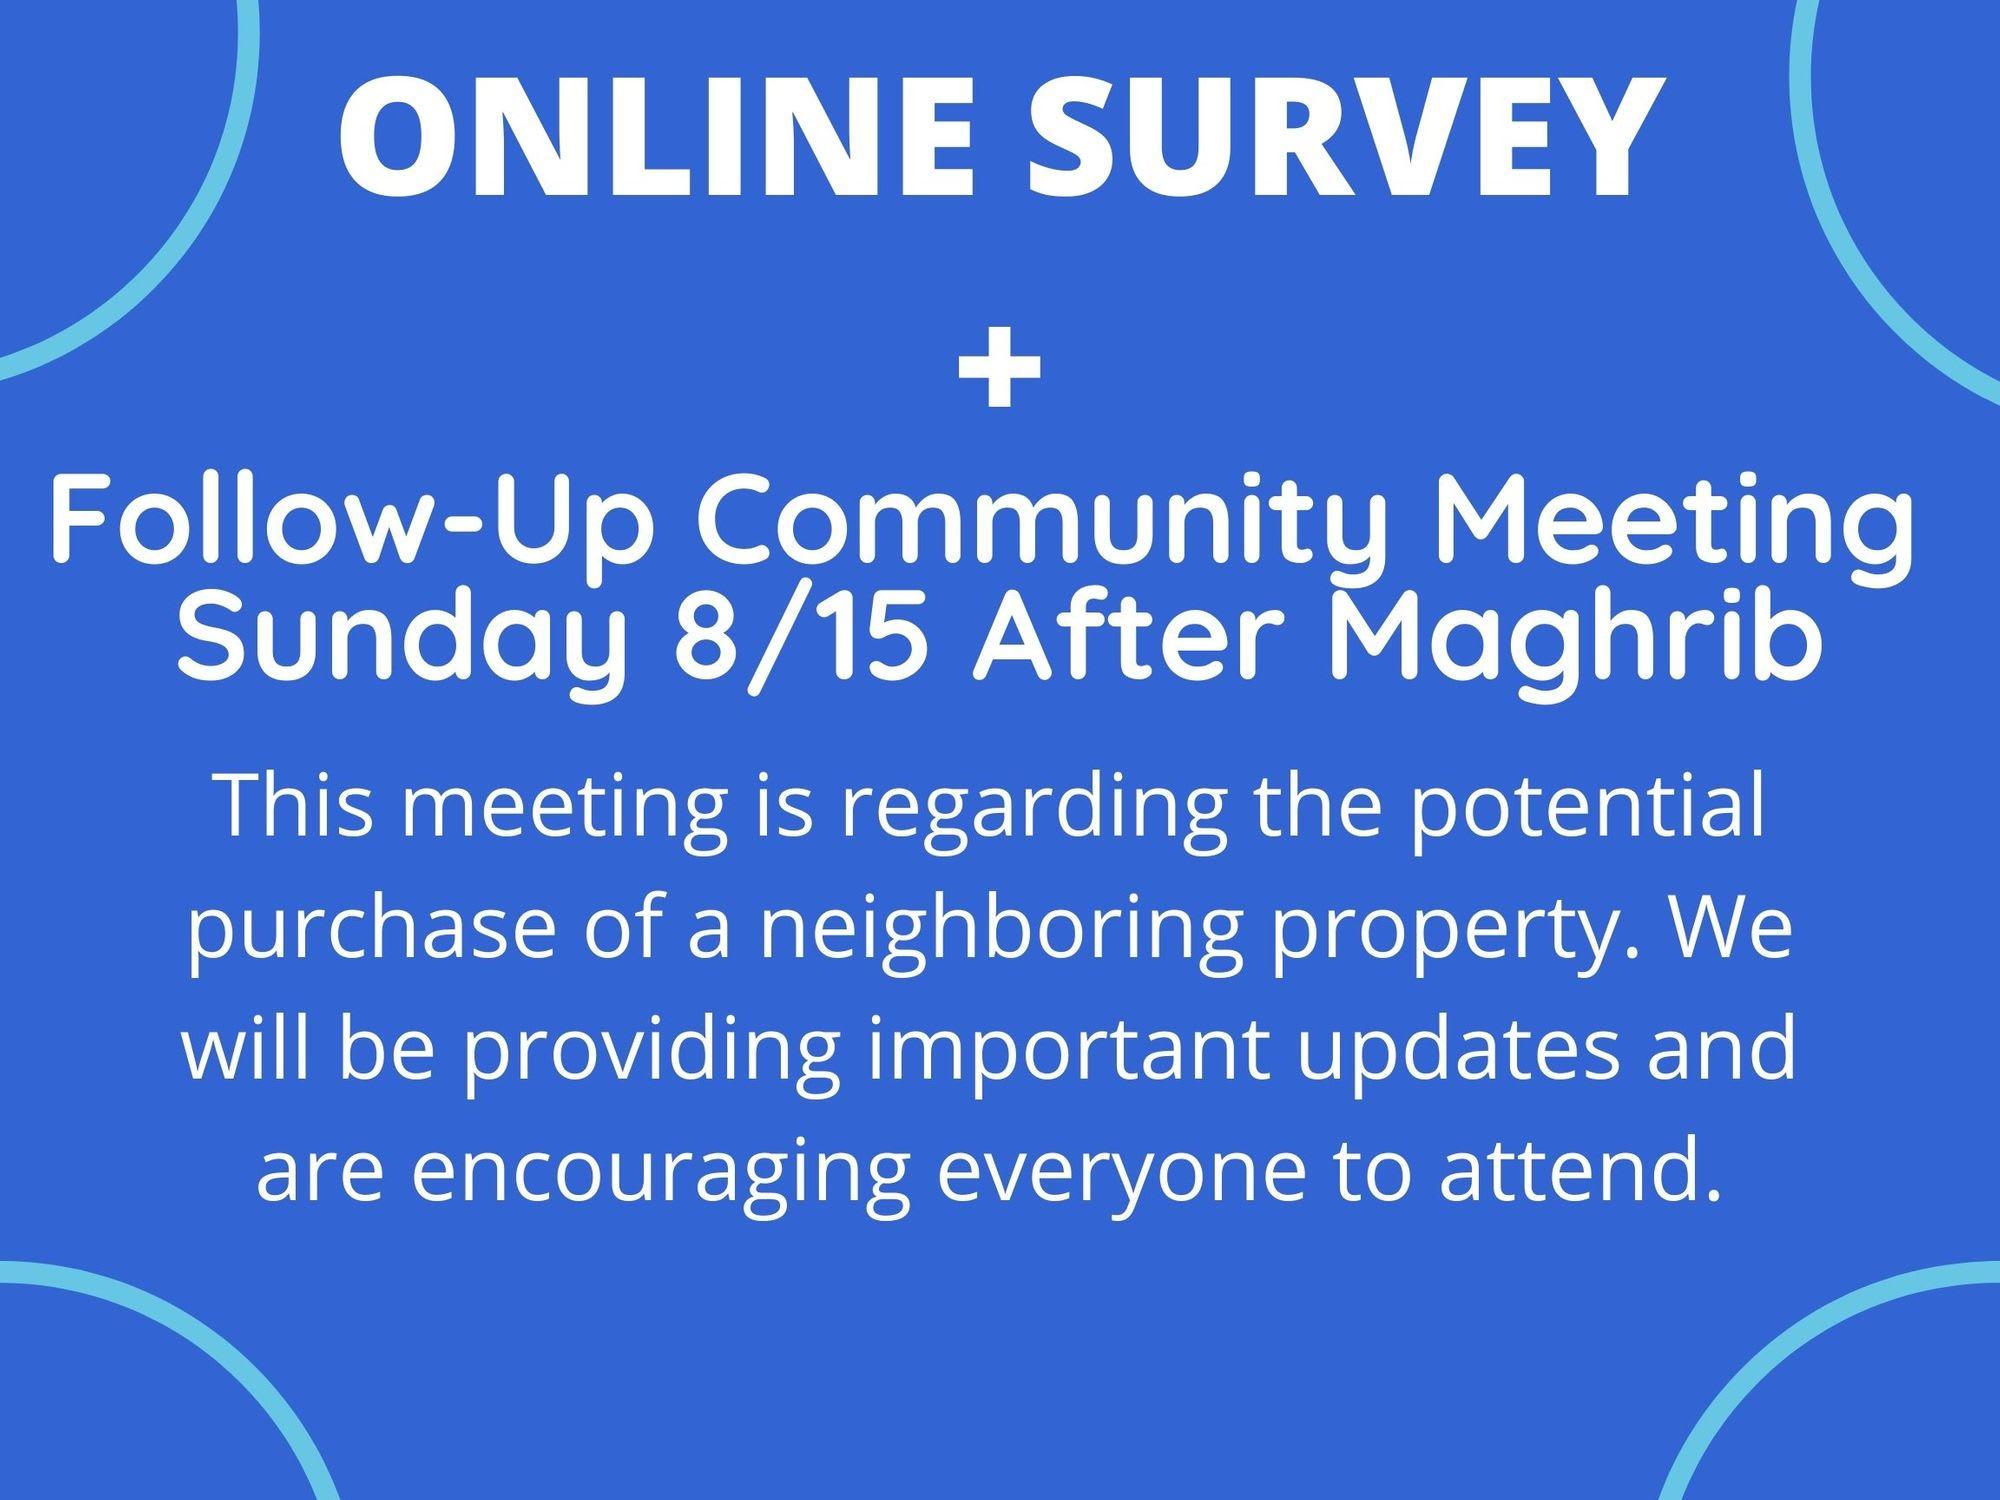 Masjid Al-Rahman Follow Up Meeting - Property Purchase Online Survey